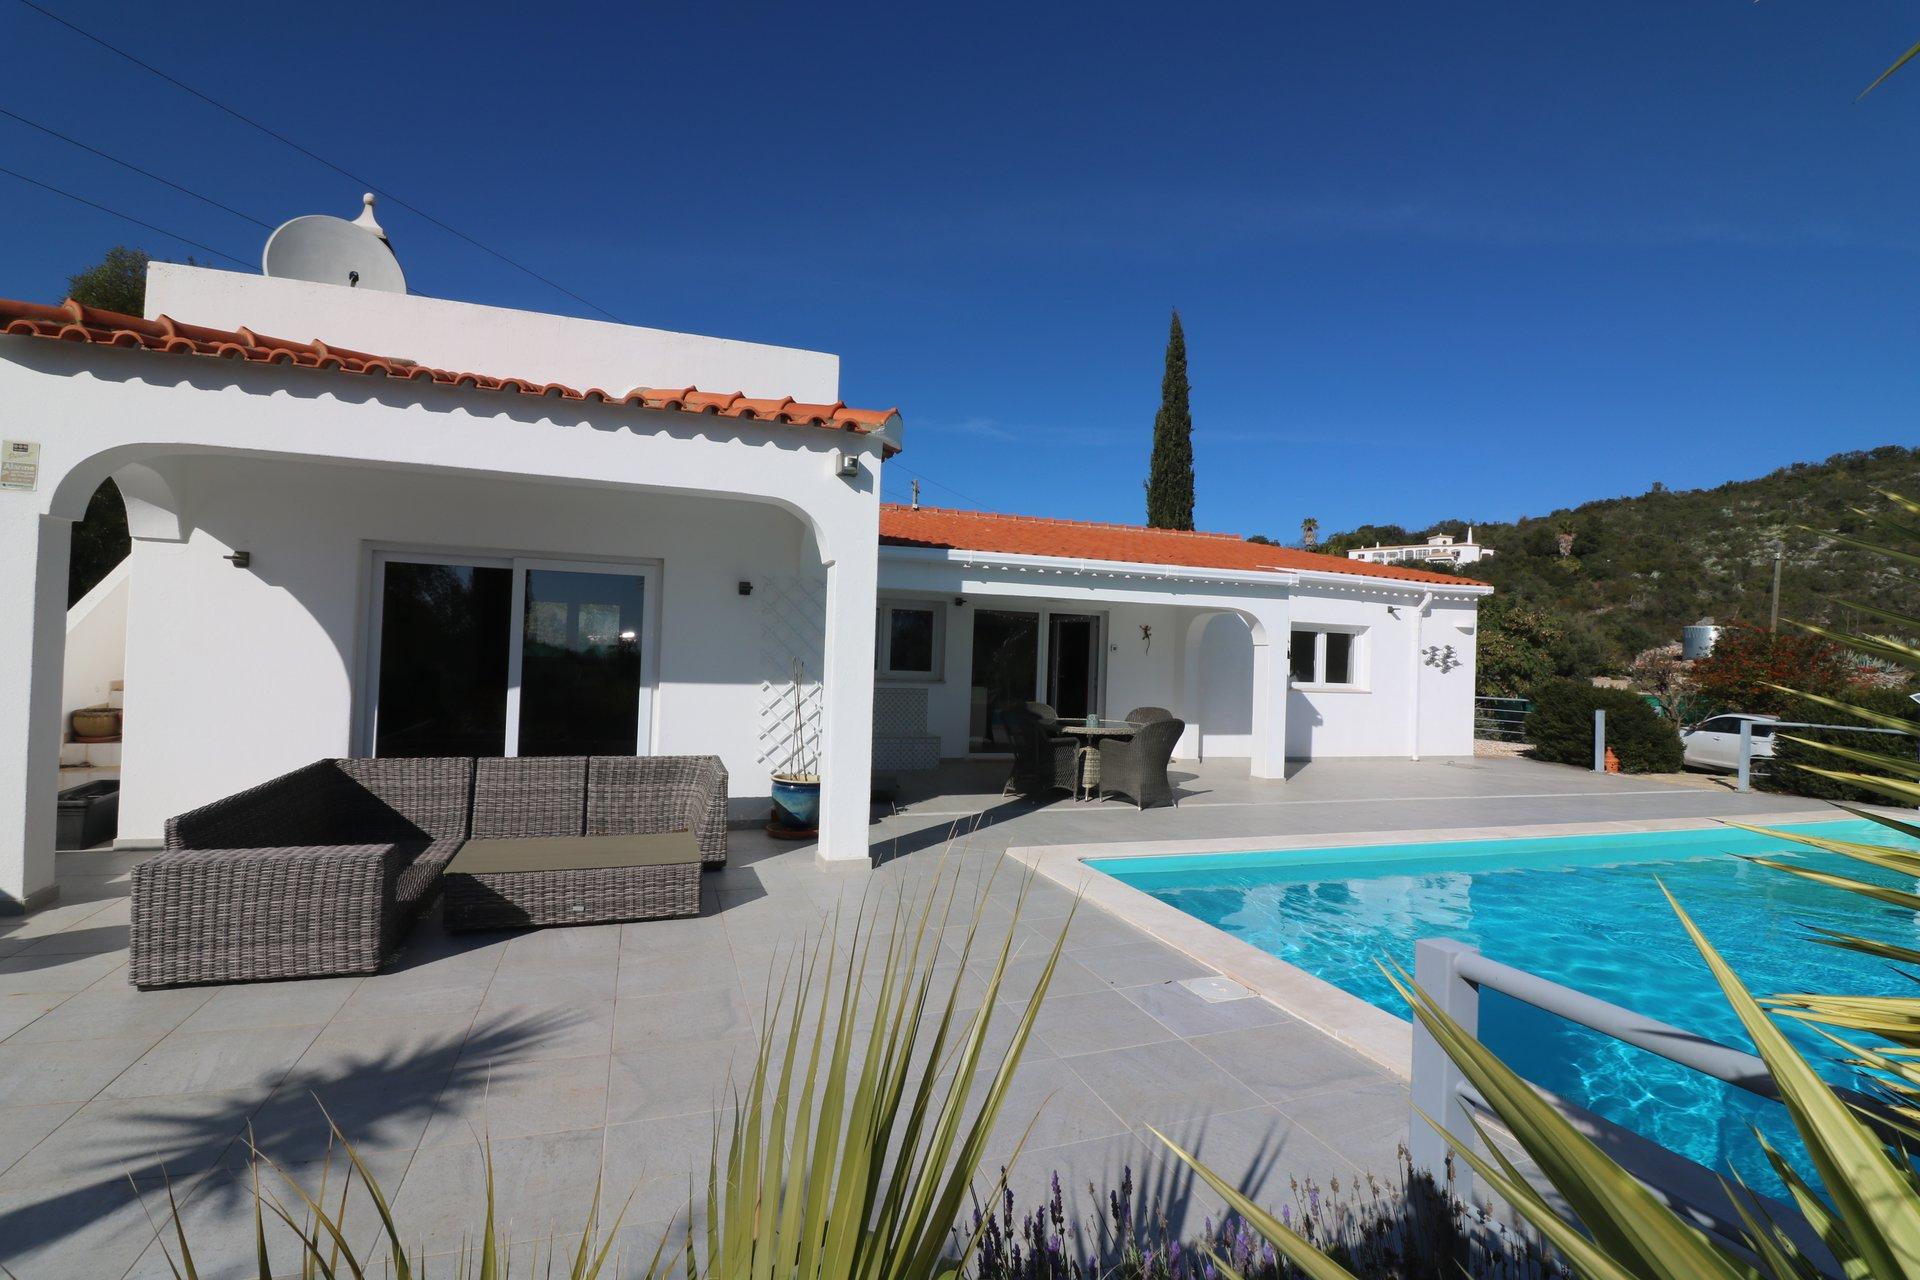 4 Bedroom Villa Santa Barbara de Nexe, Central Algarve Ref: JV10409